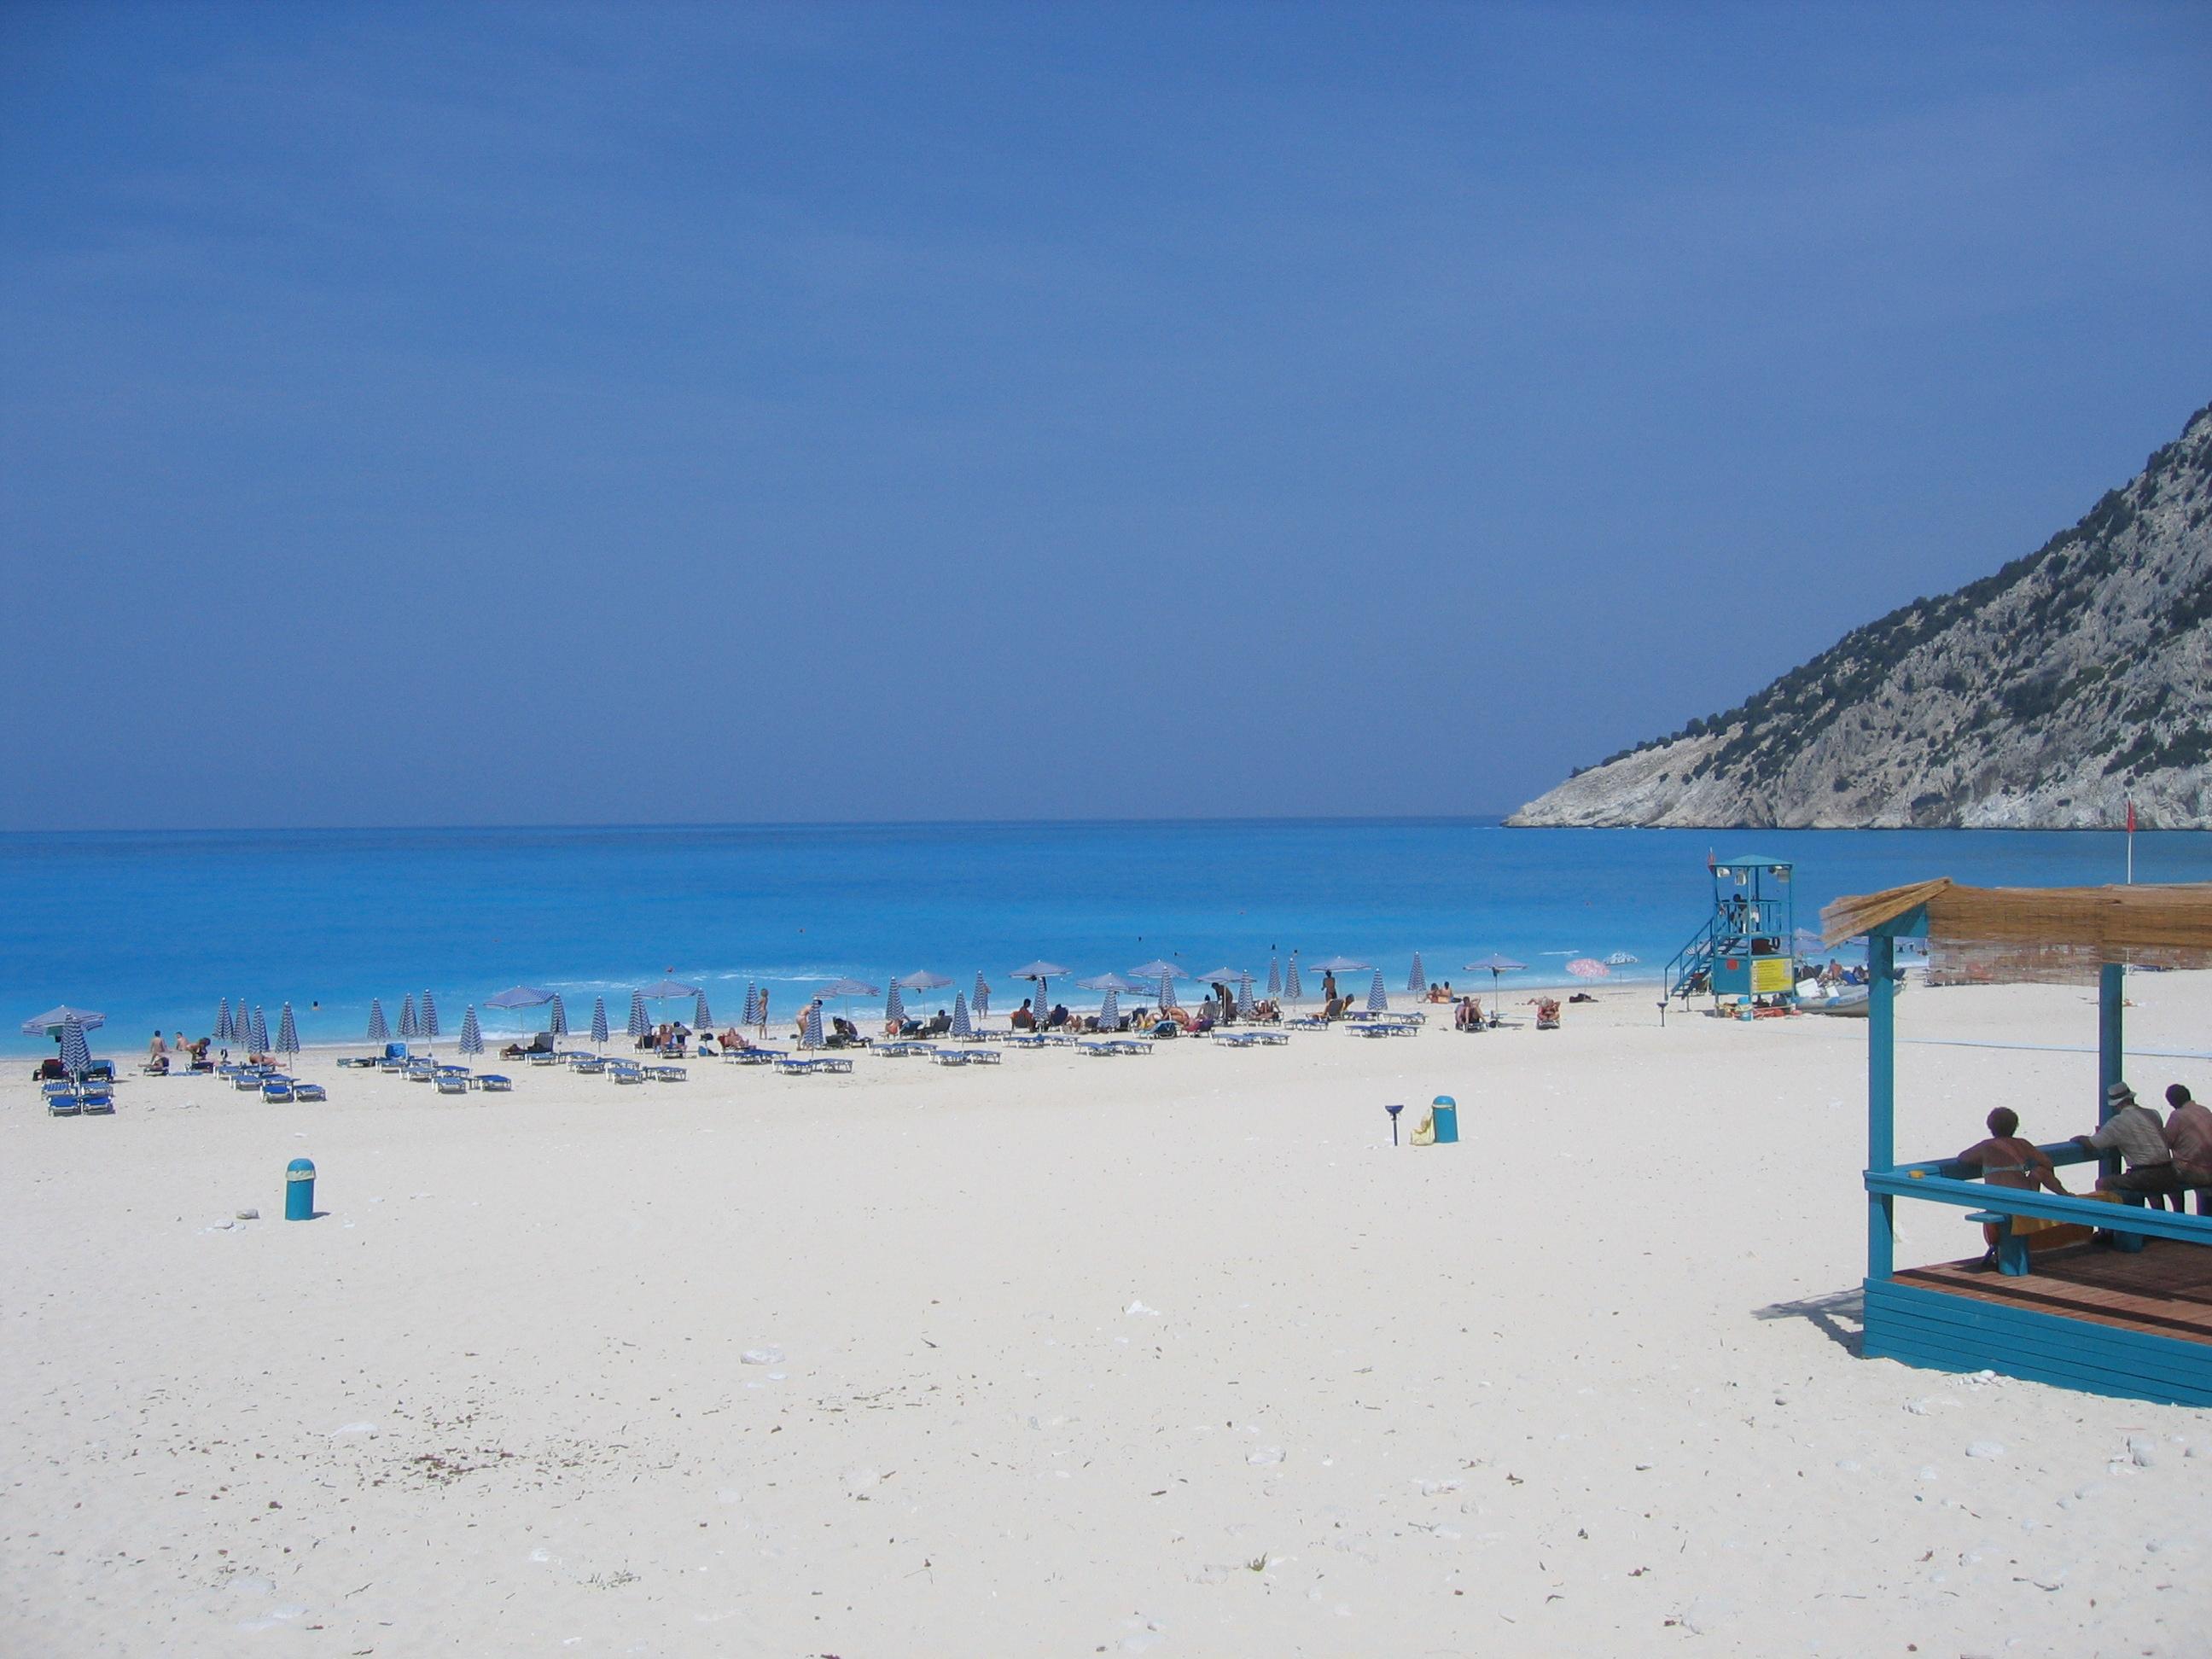 English: Myrtos Beach, Kefalonia. Greece. The ...